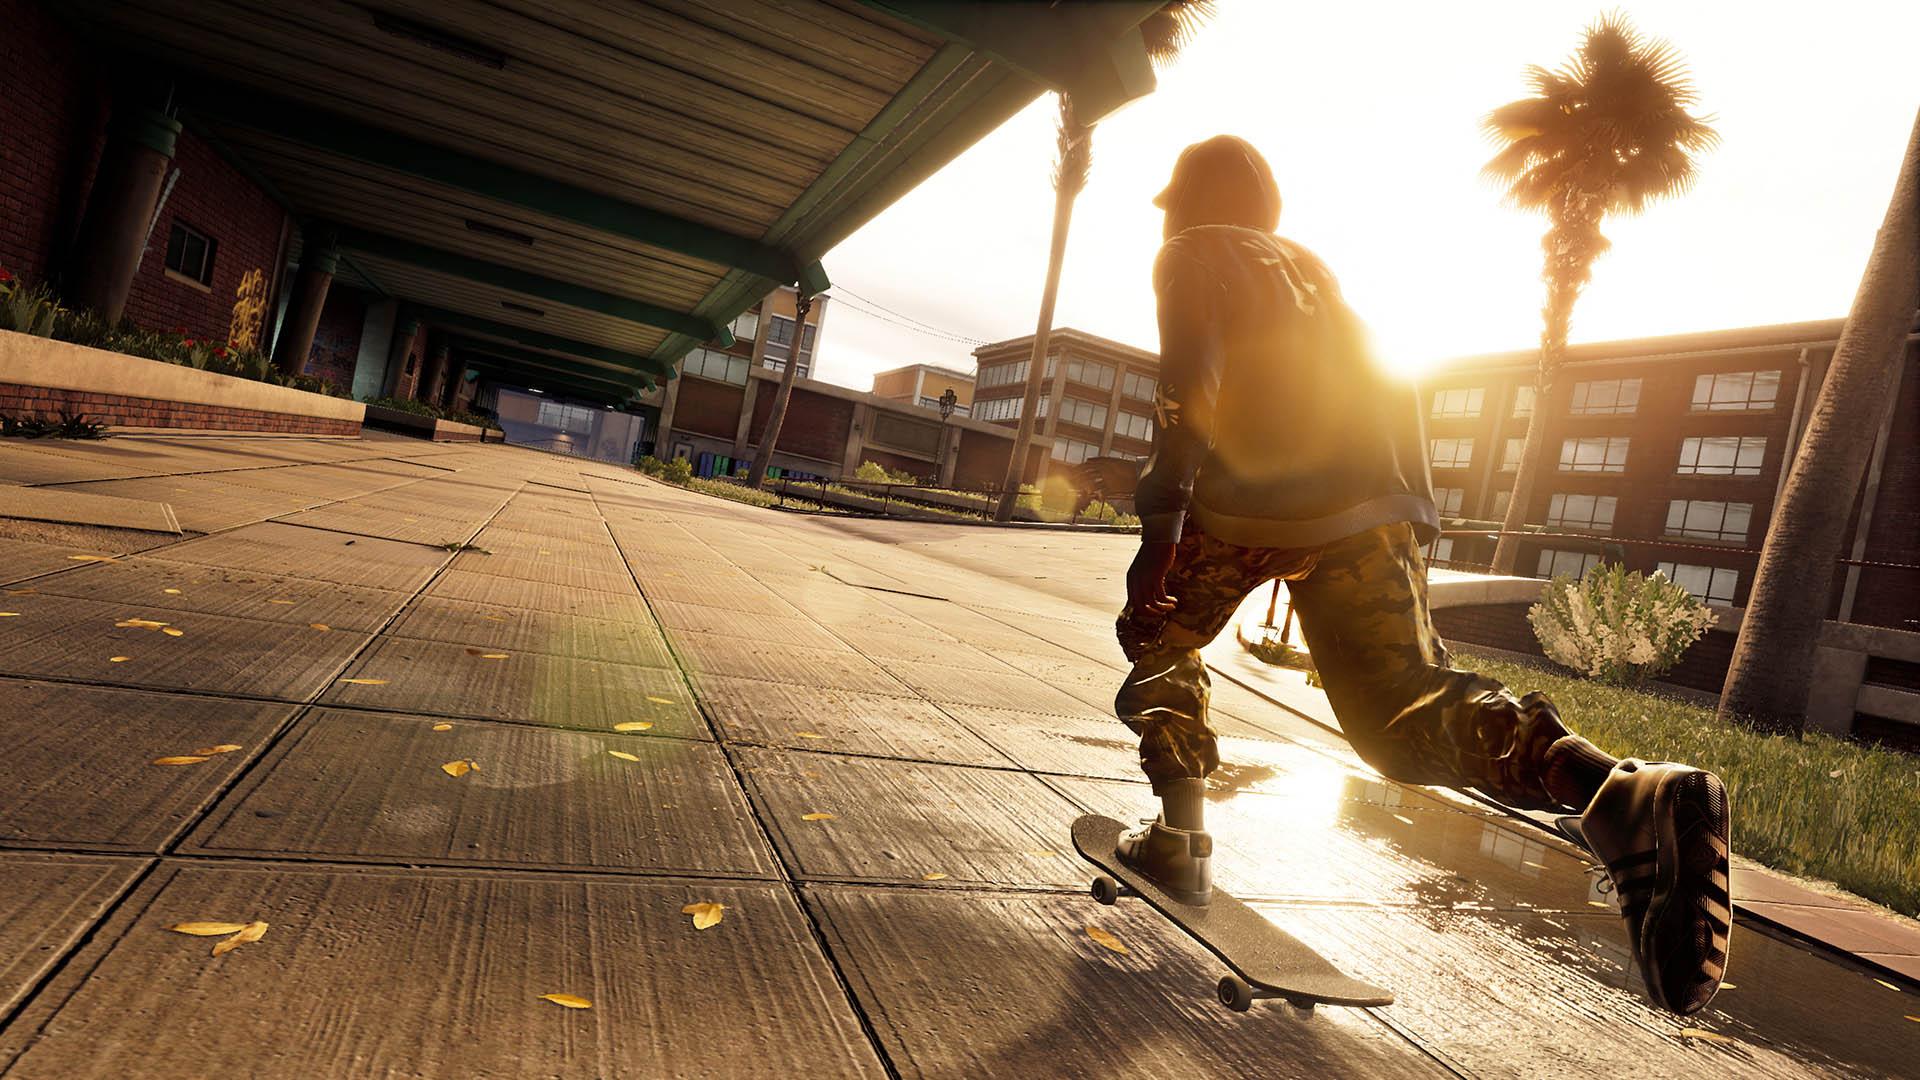 Tony Hawk Pro Skater 2 - Remastered